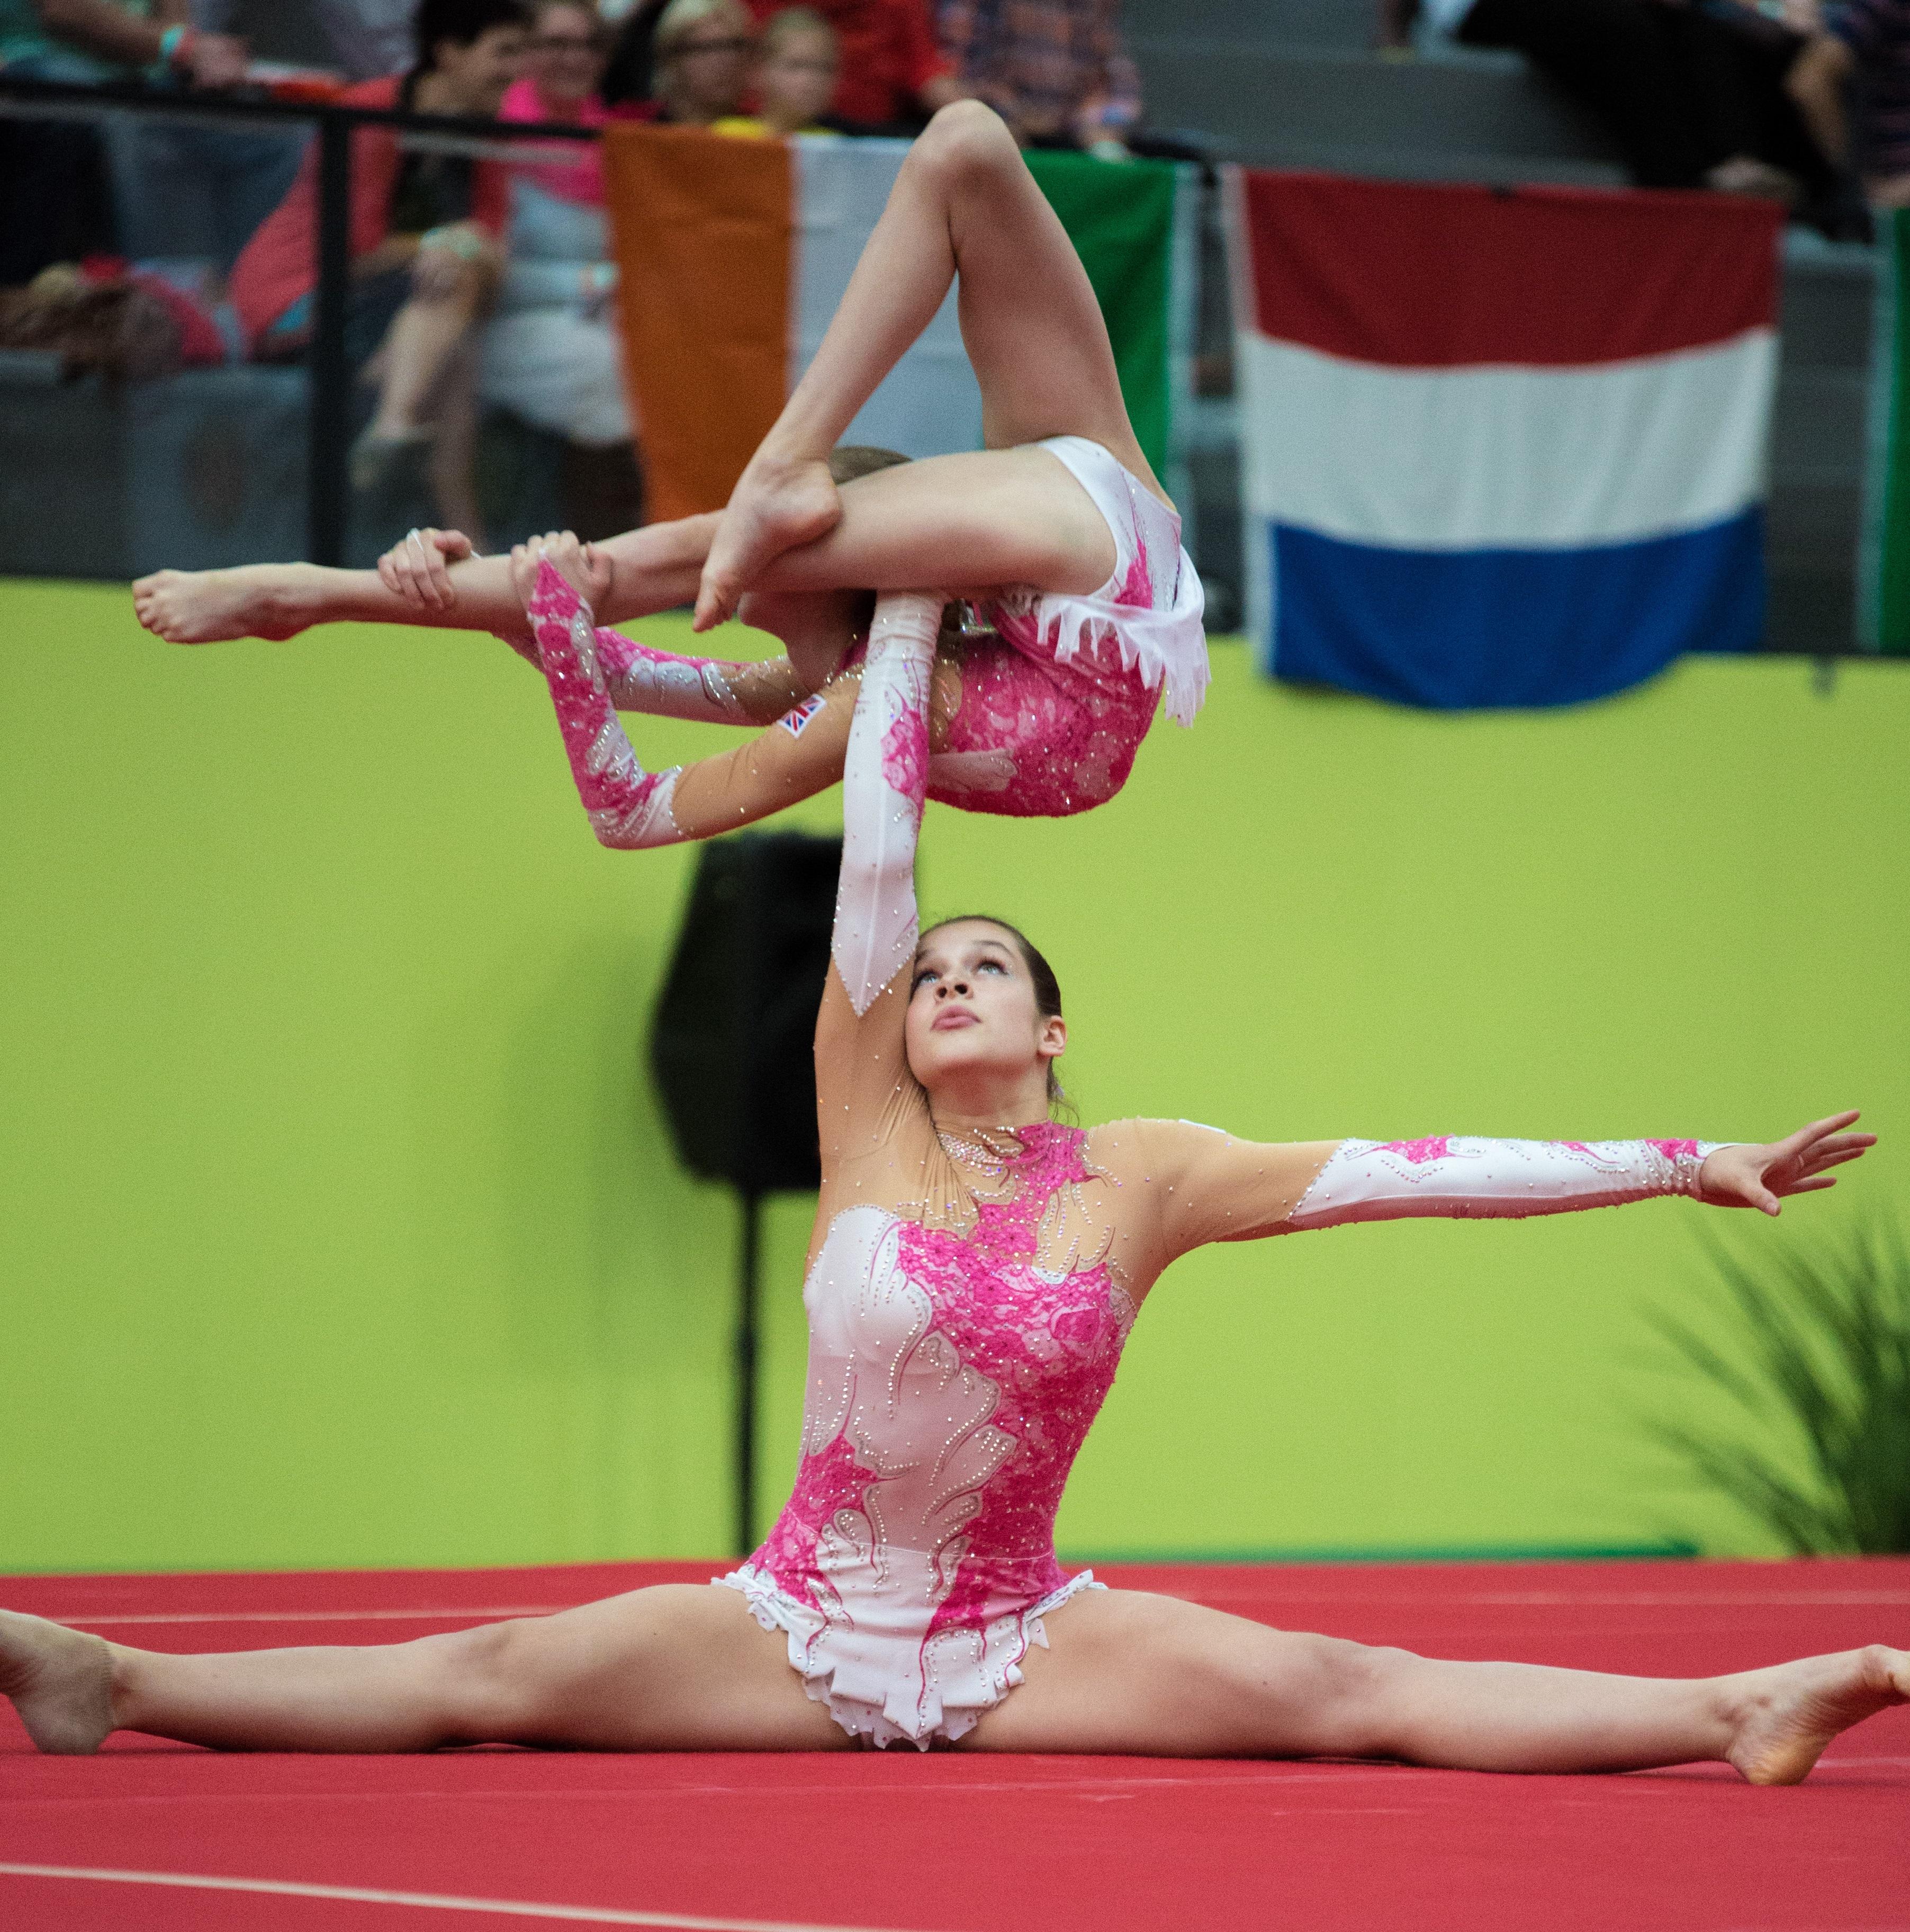 Acrobatics Kids Definition